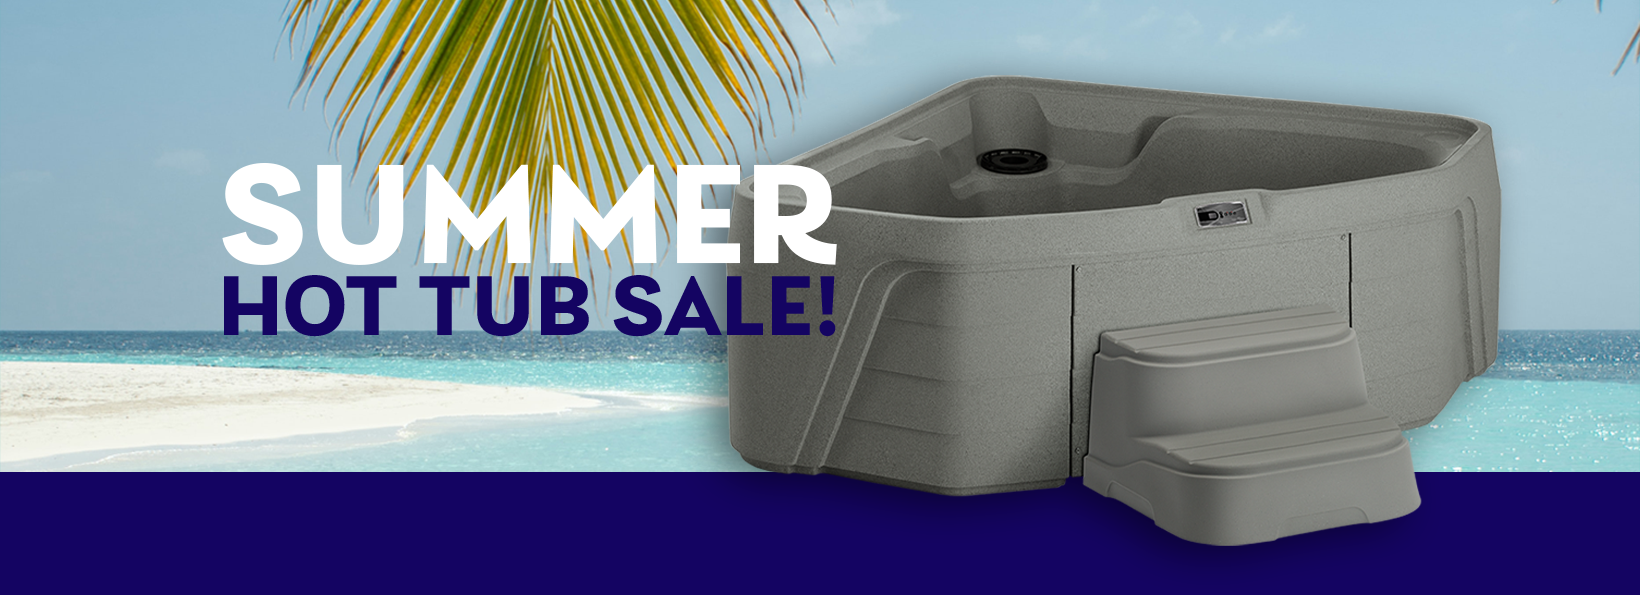 Summer Hot Tub Sale!